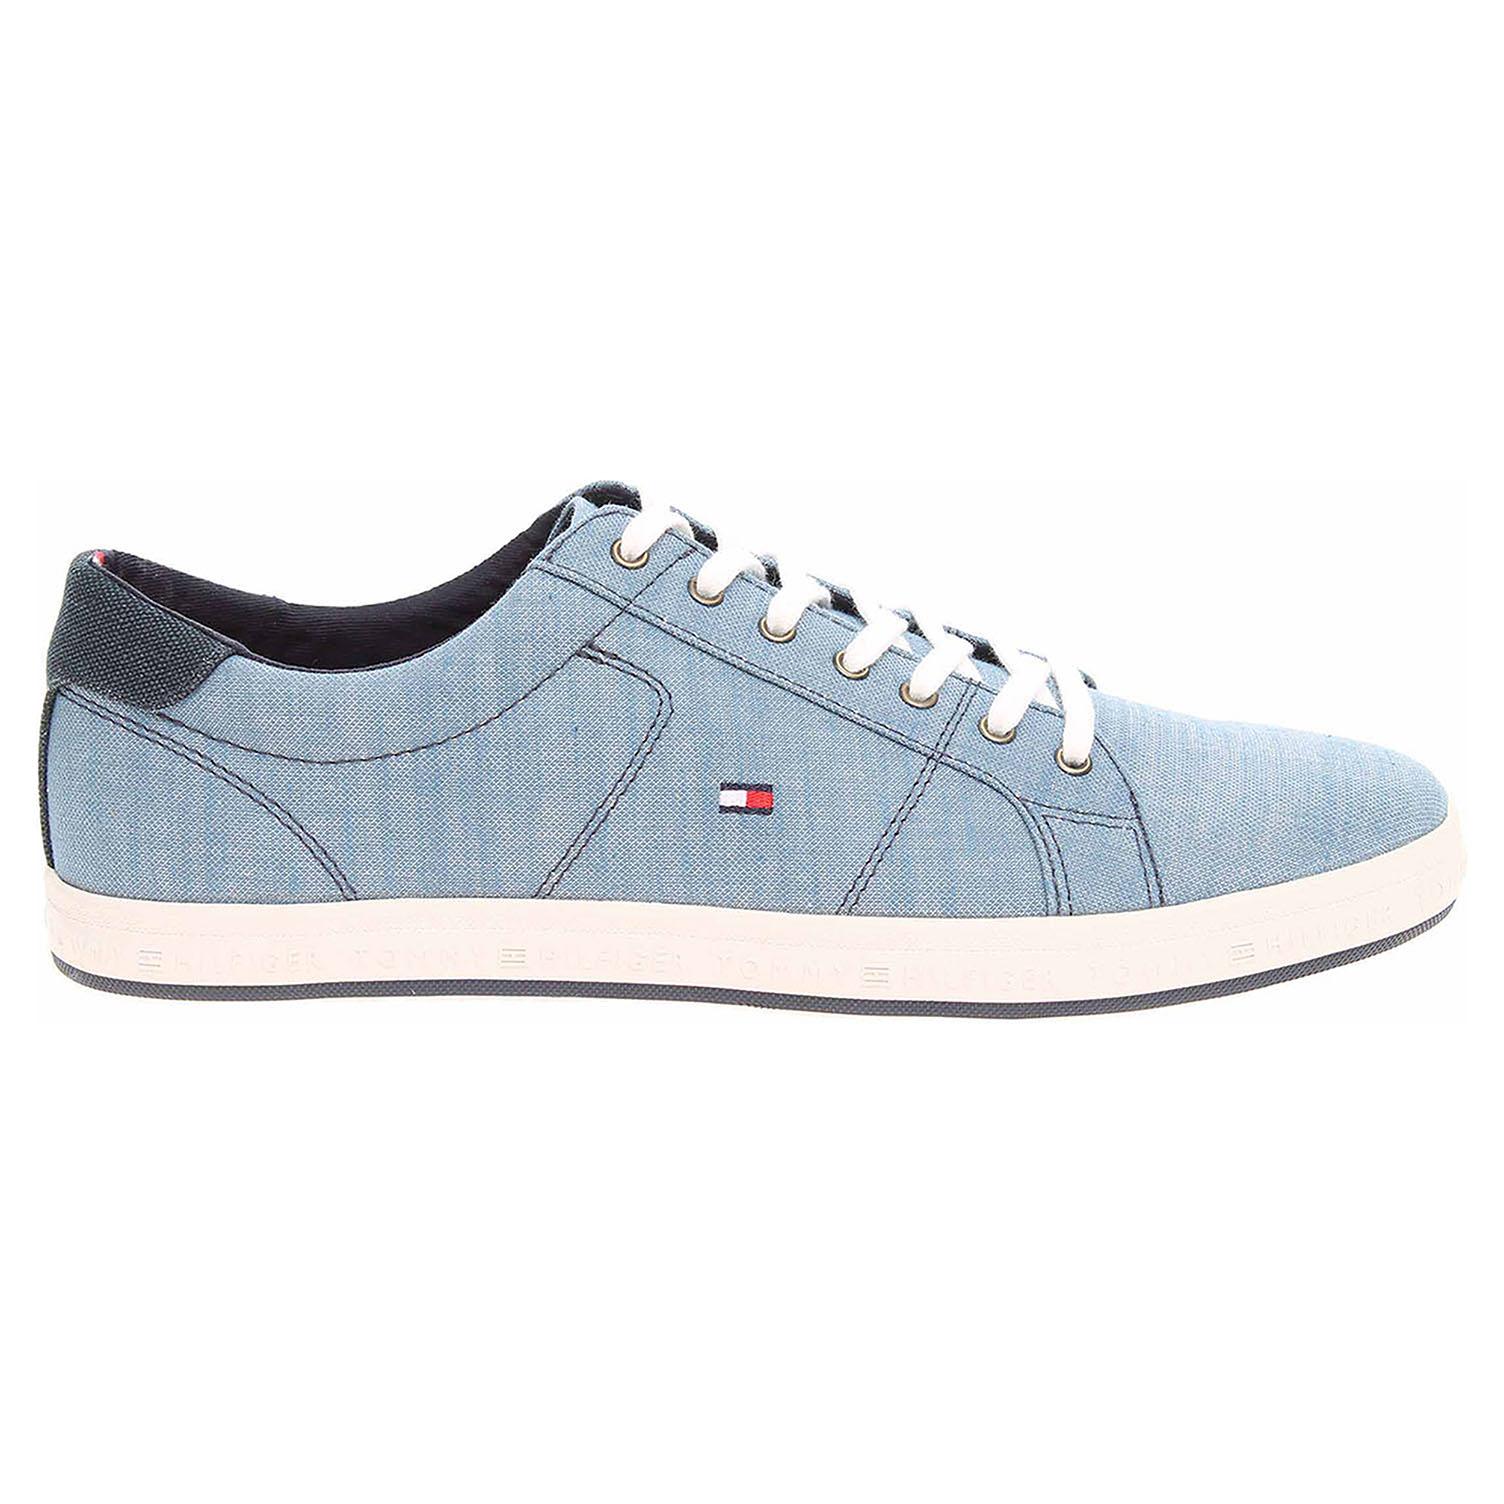 8e096e710e3 Ecco Tommy Hilfiger pánská obuv FM0FM01378 013 jeans 24000493